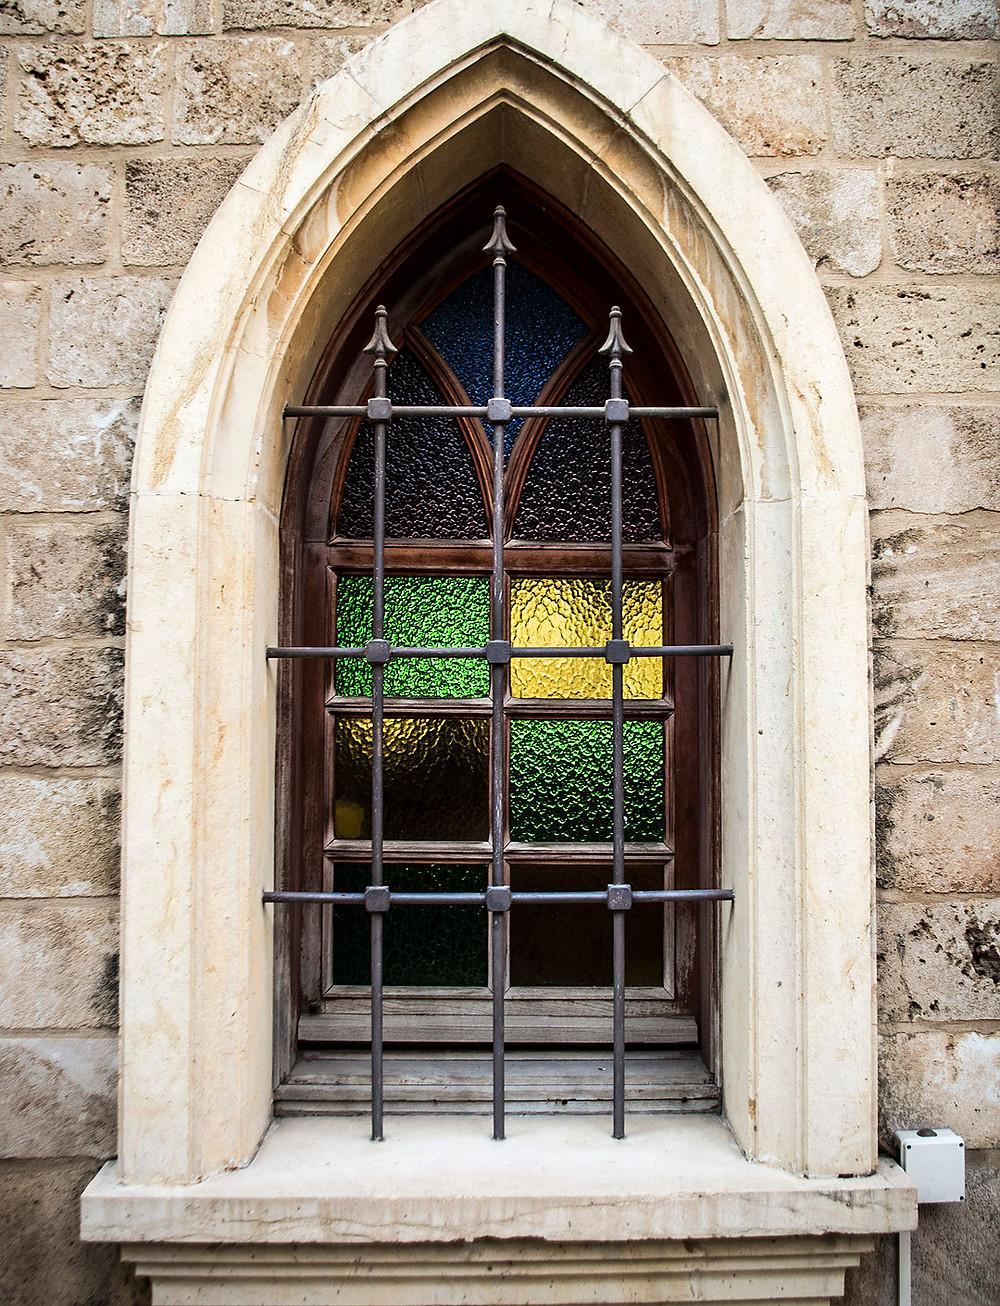 Window of the Al Majidieh Mosque